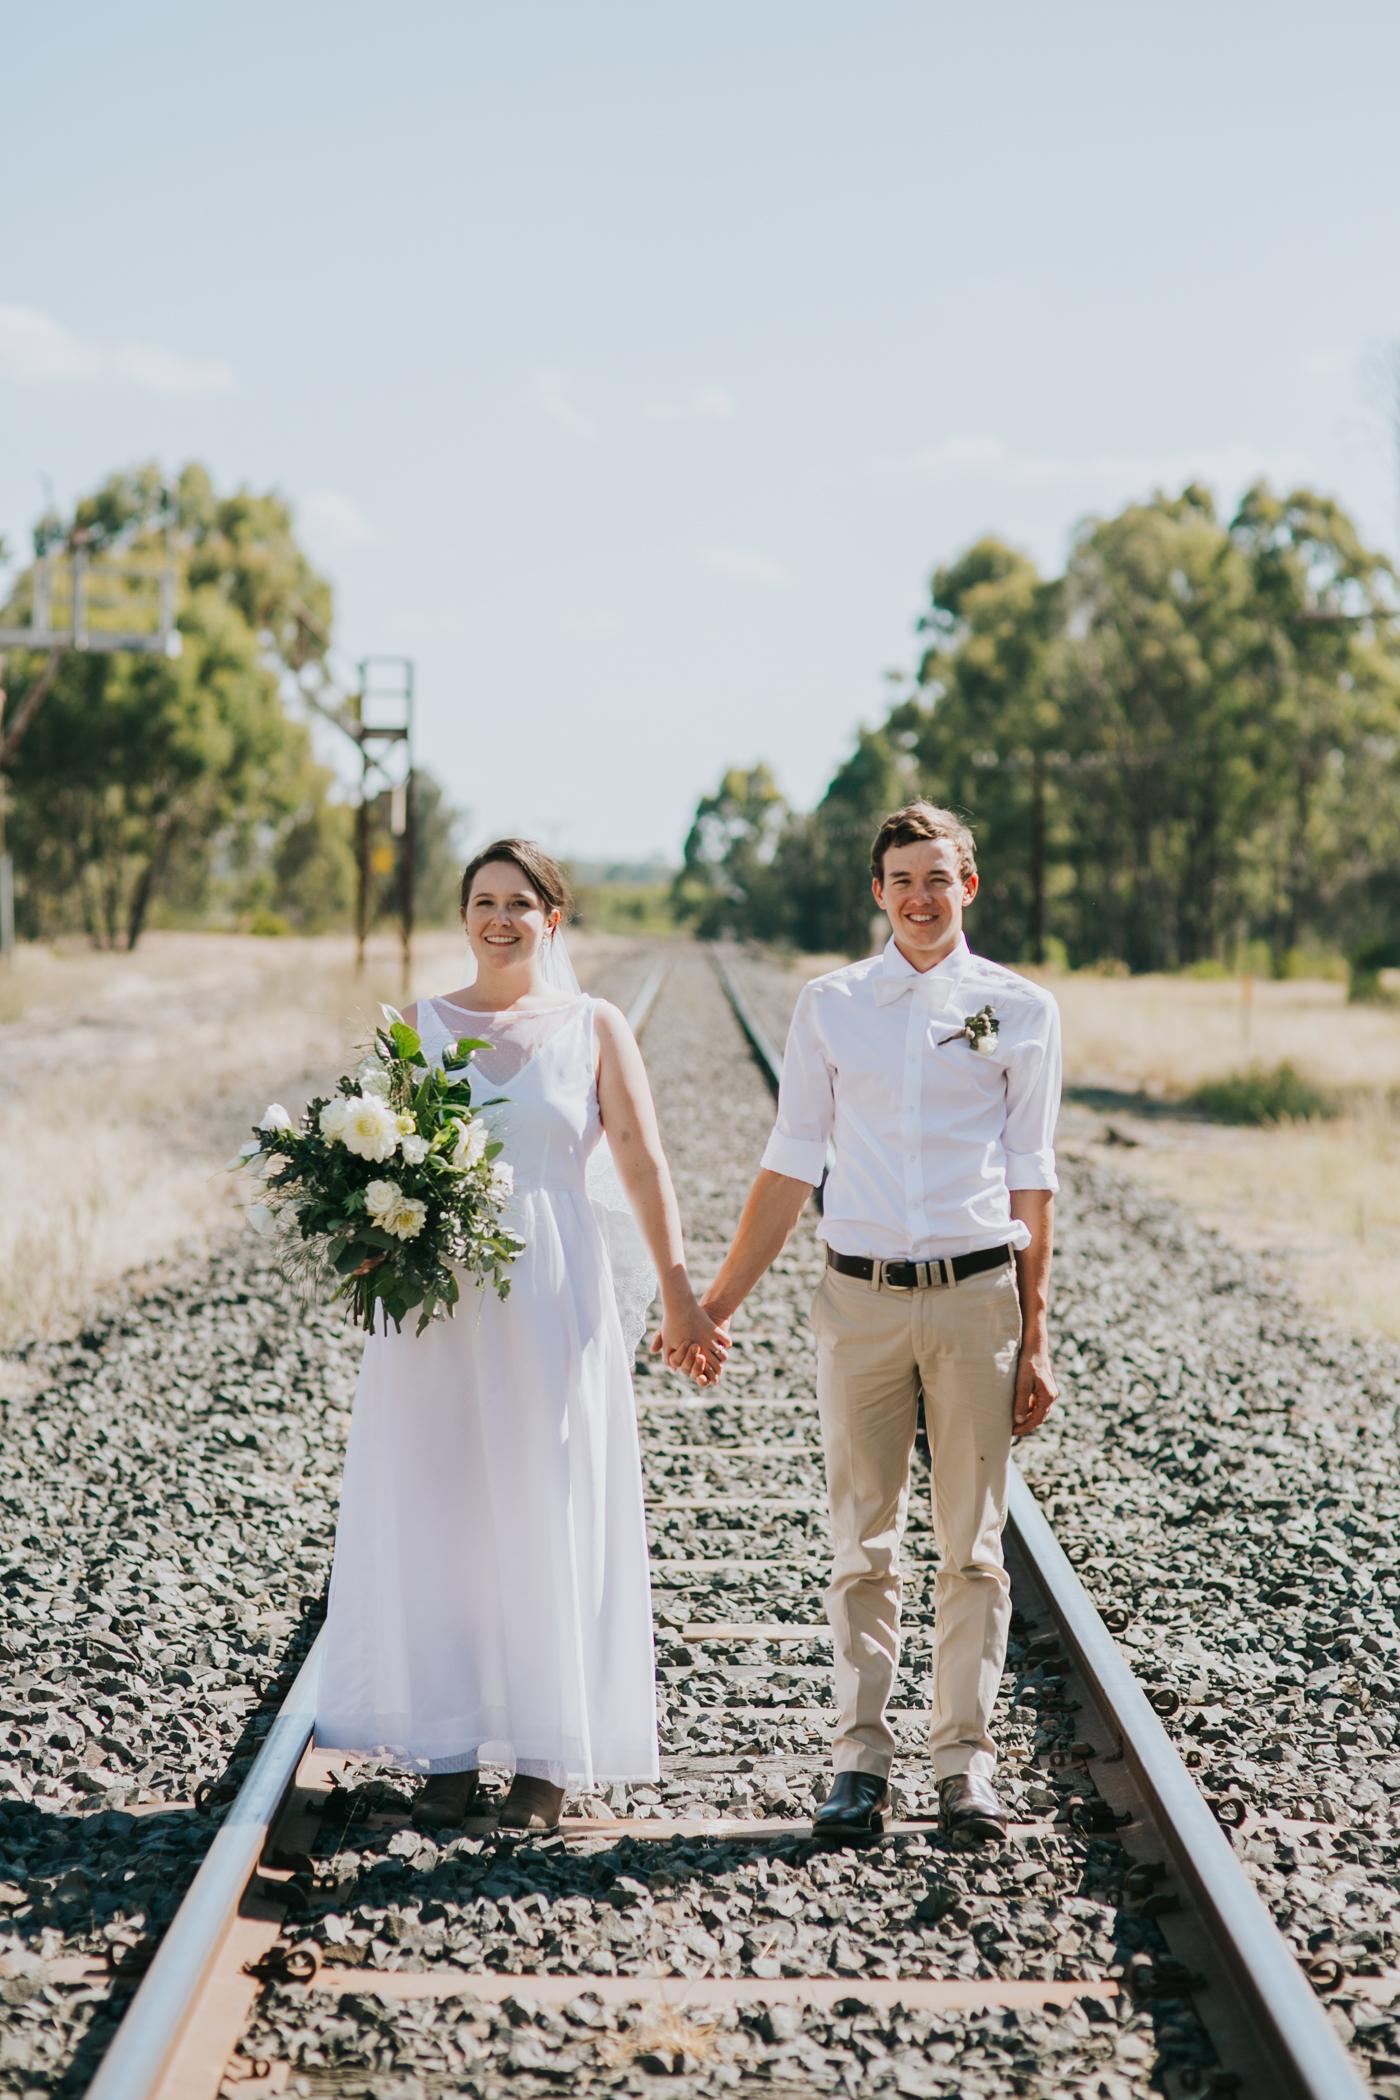 Nicolle & Jacob - Dubbo Wedding - Country Australia - Samantha Heather Photography-132.jpg